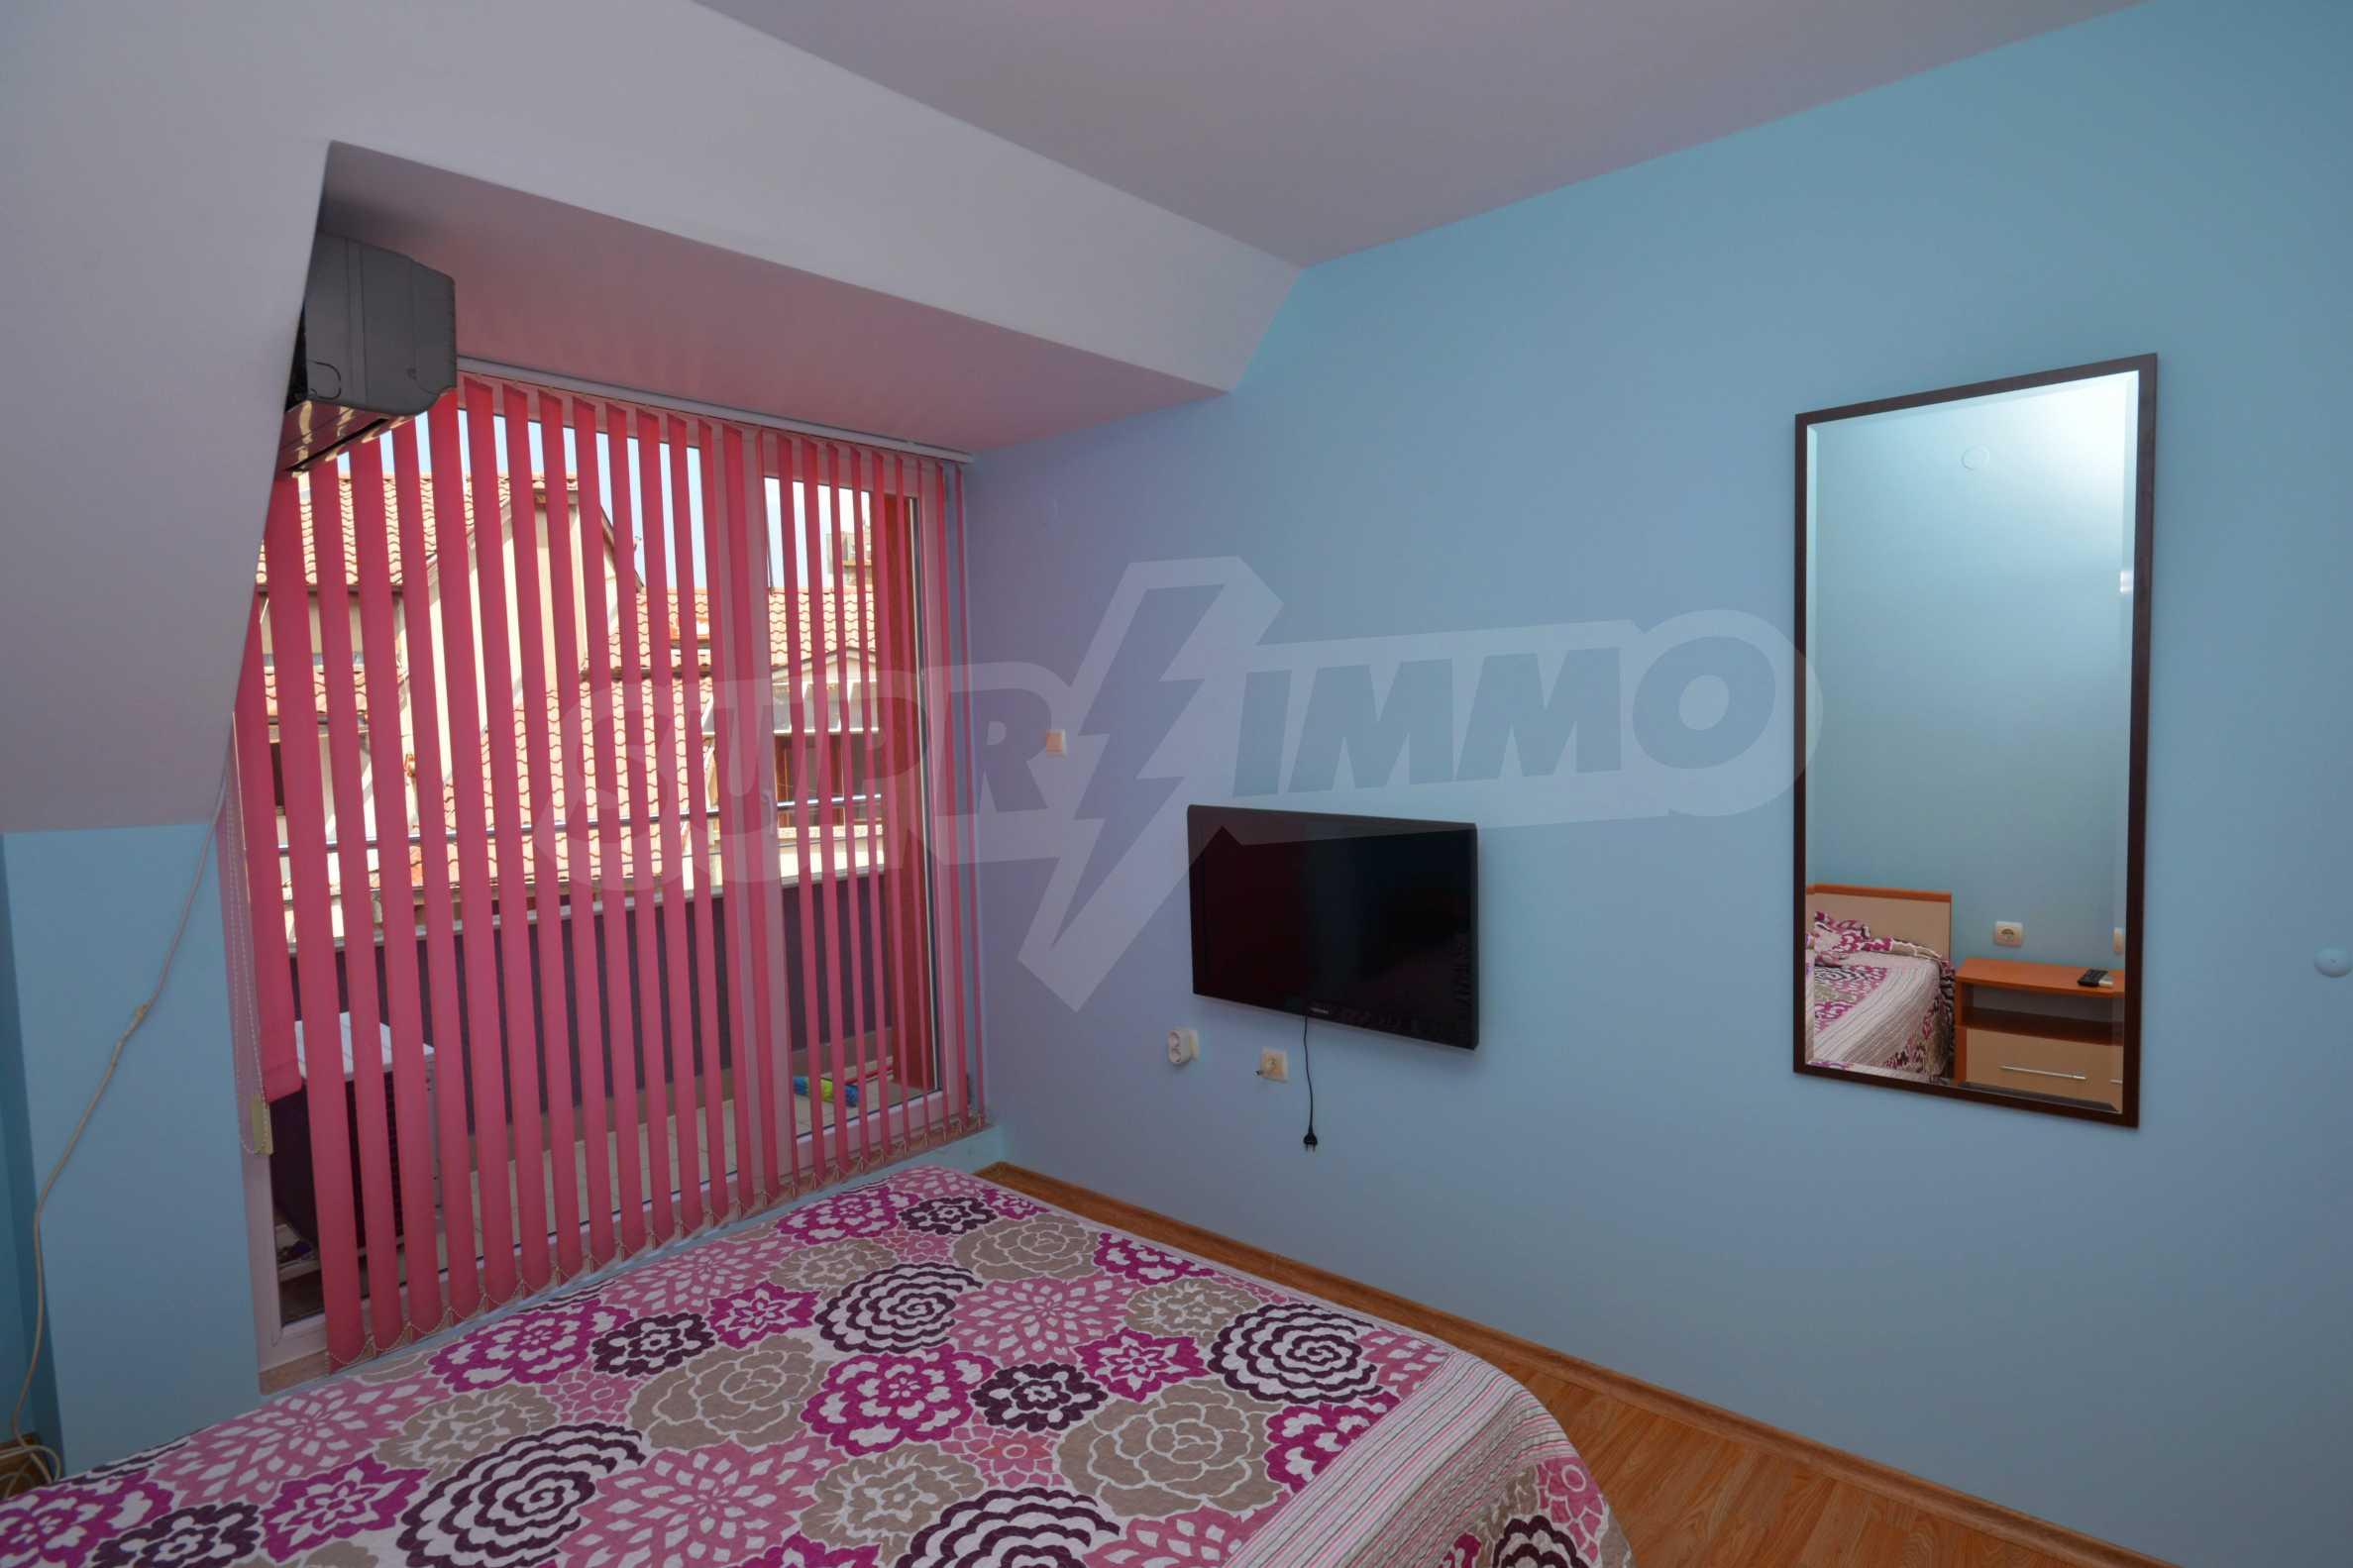 Многостаен апартамент до Гранд Хотел Пловдив 8